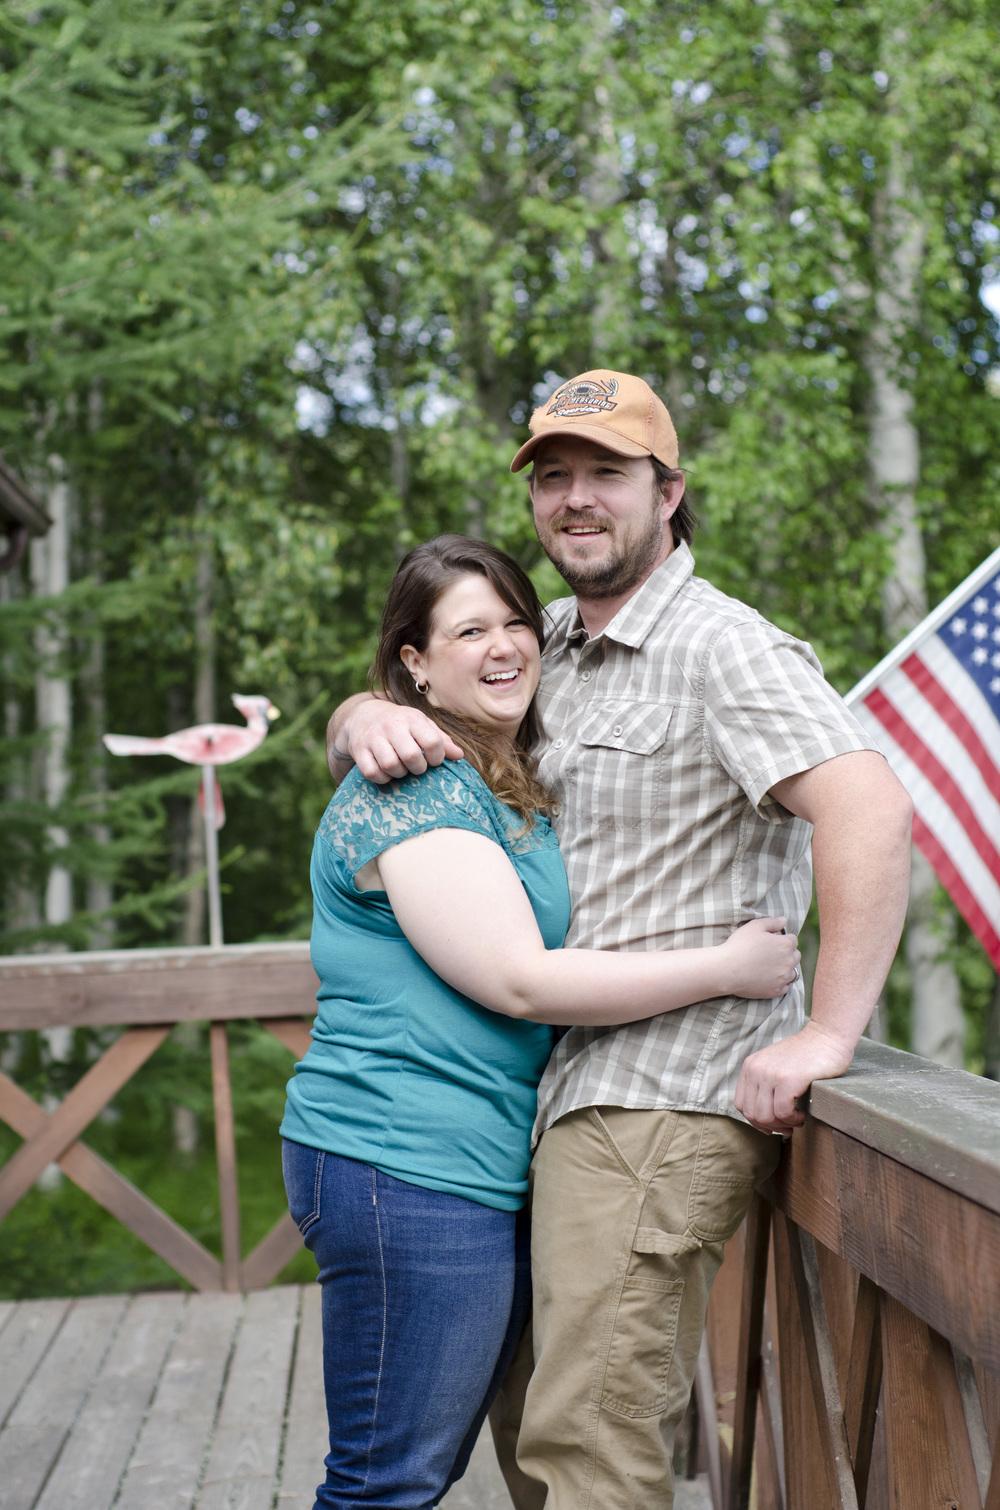 Fairbanks Alaska engagement photos - outdoor photographer